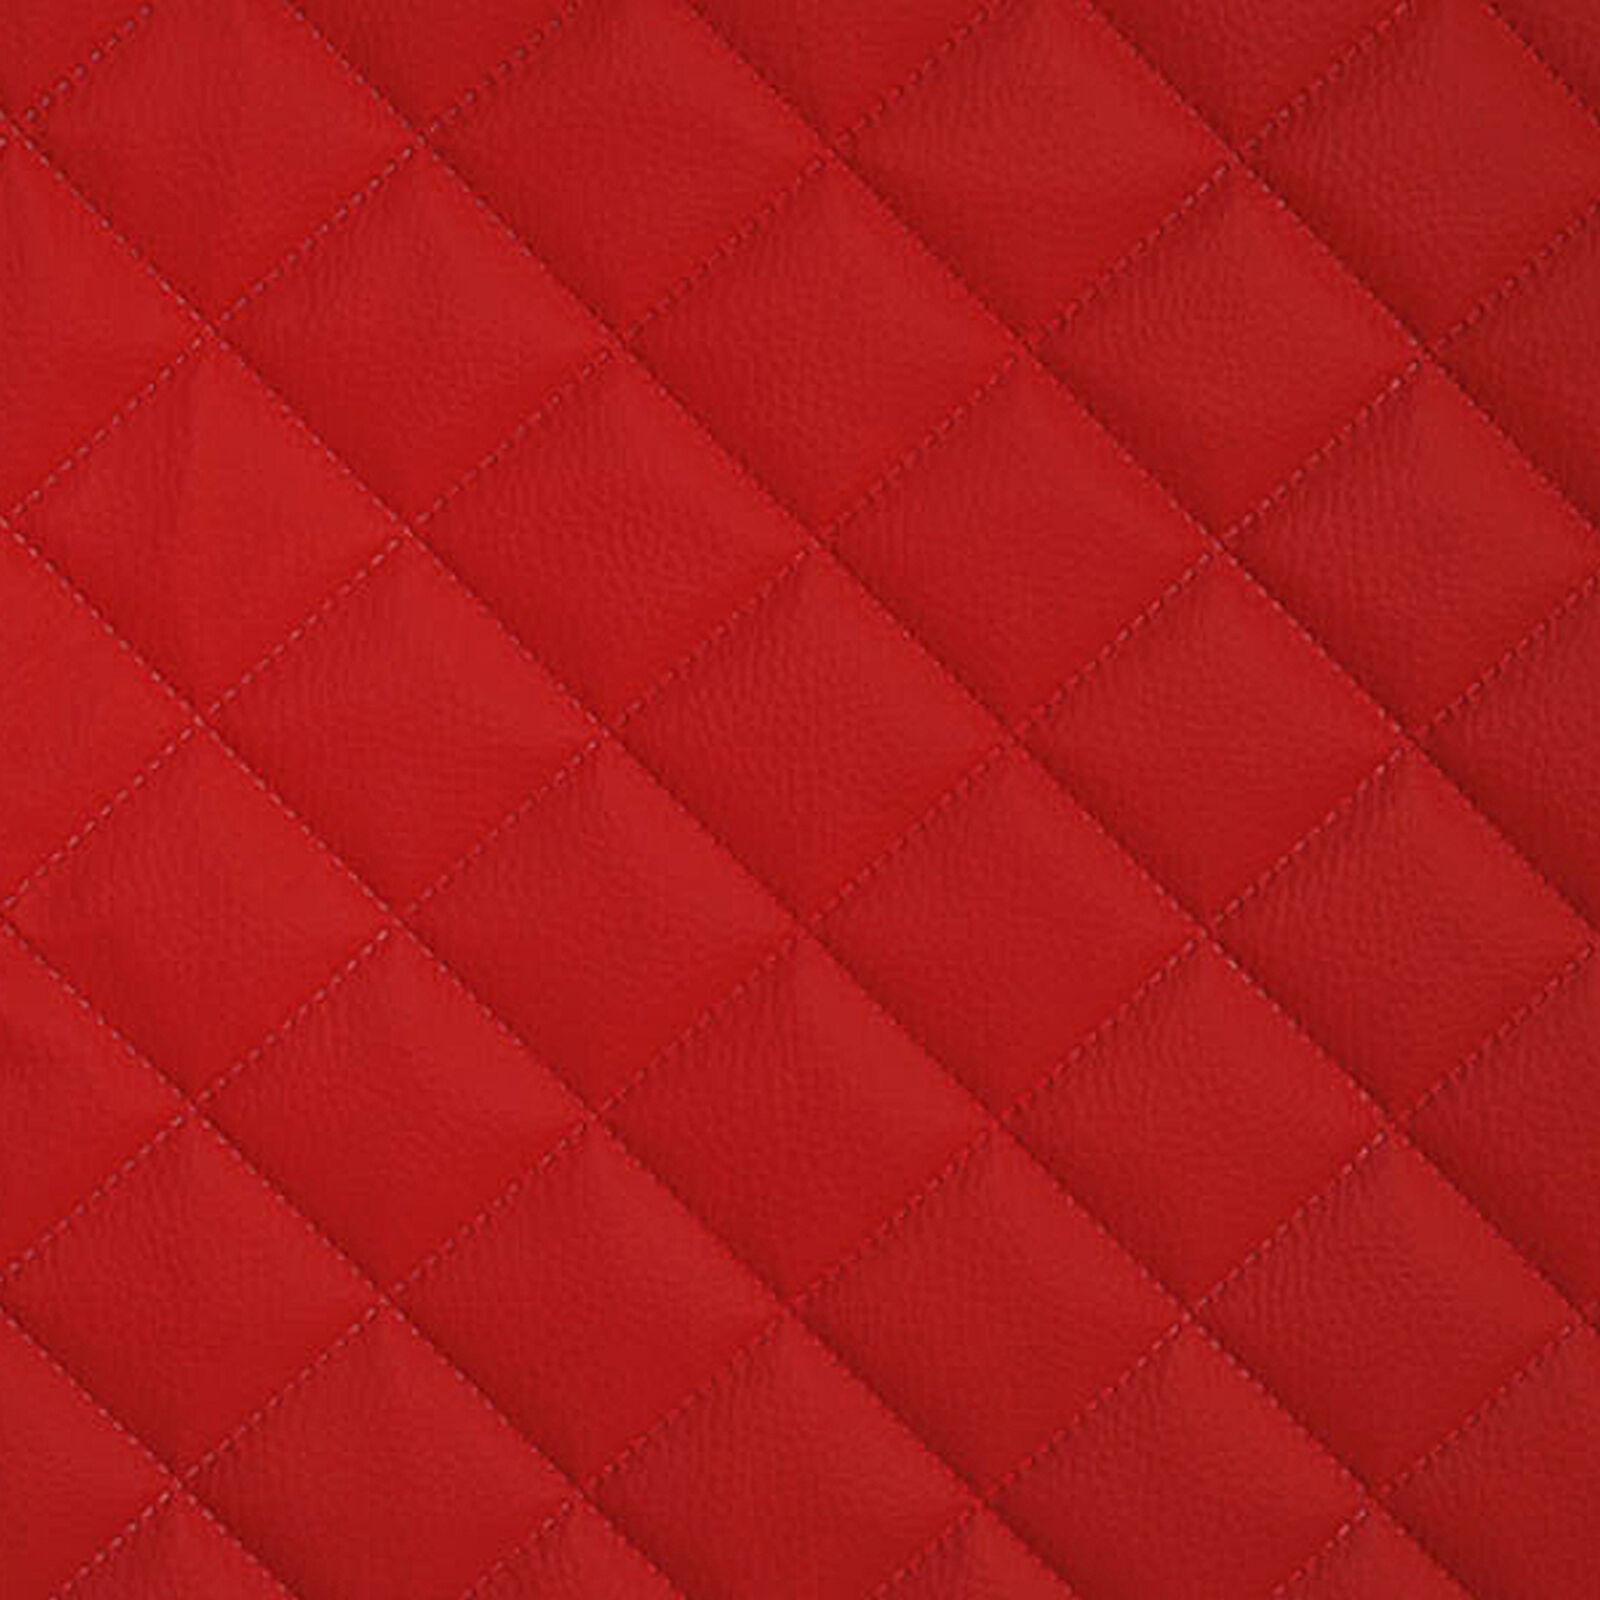 simili cuir piqu s rouge tissu ameublement vendu au m tre. Black Bedroom Furniture Sets. Home Design Ideas